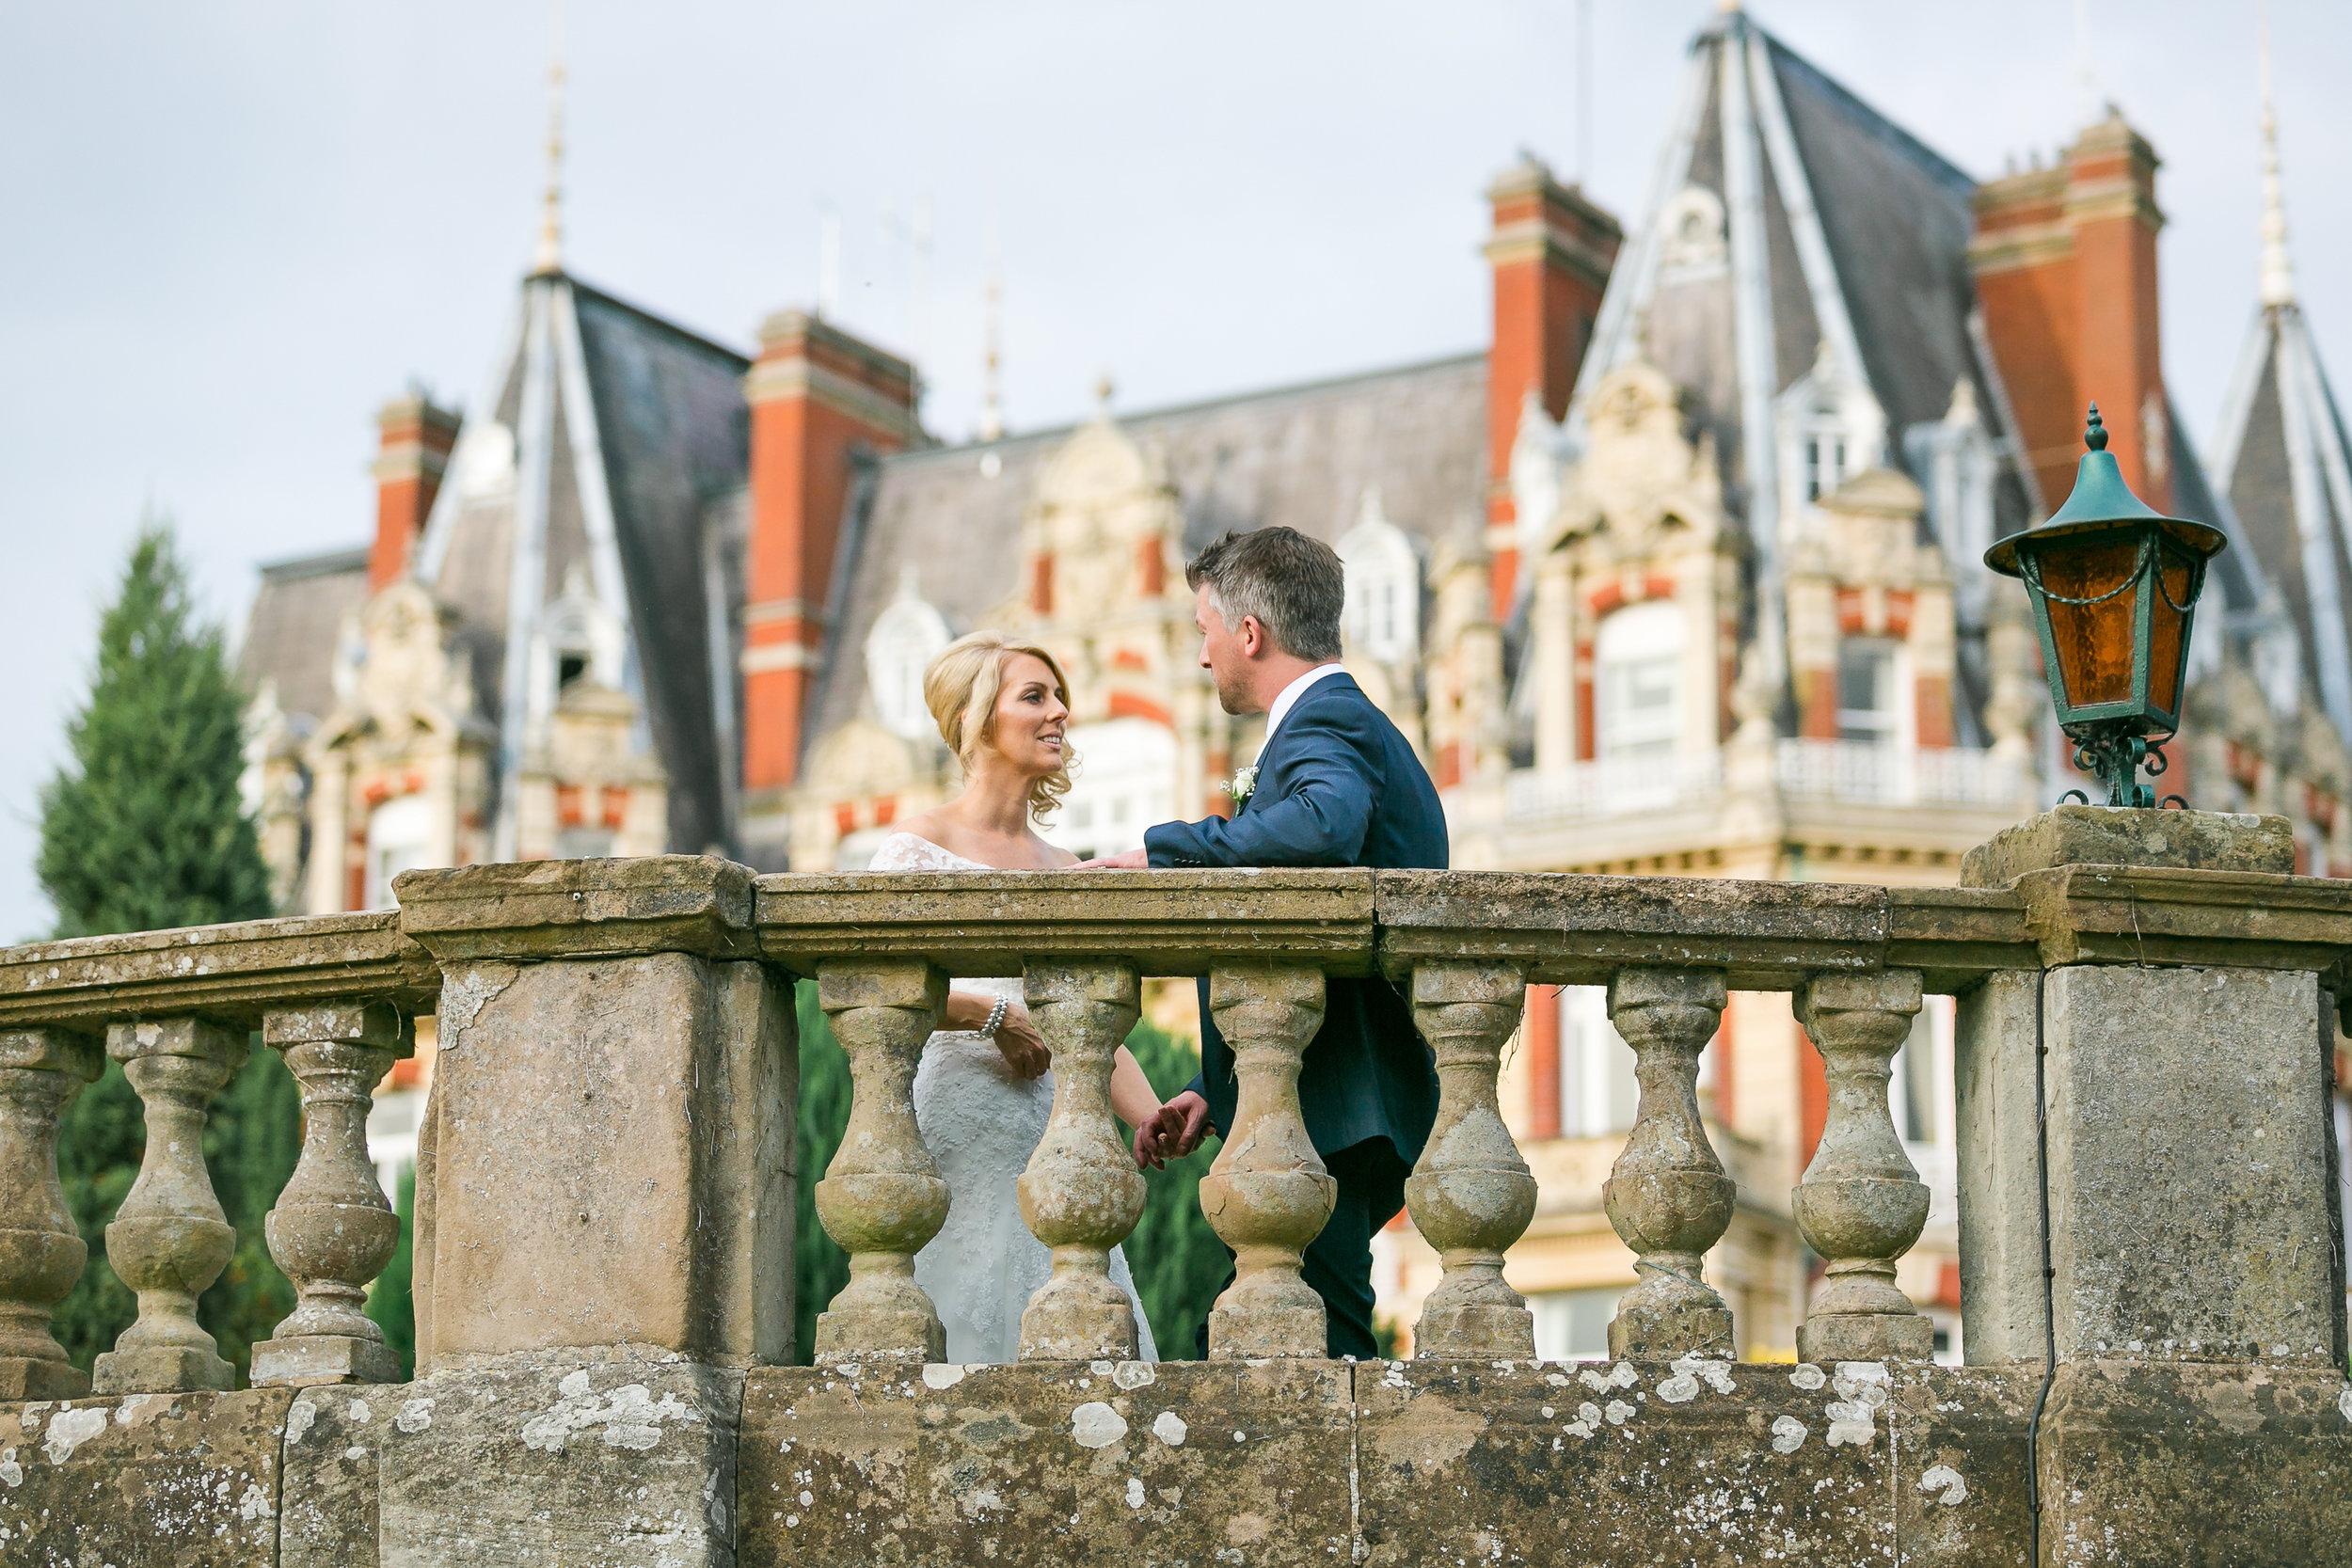 20140913-Andrea&John-373-Andrea & John-Chateau Ipmney-Wedding-Staffordshire-photo.jpg